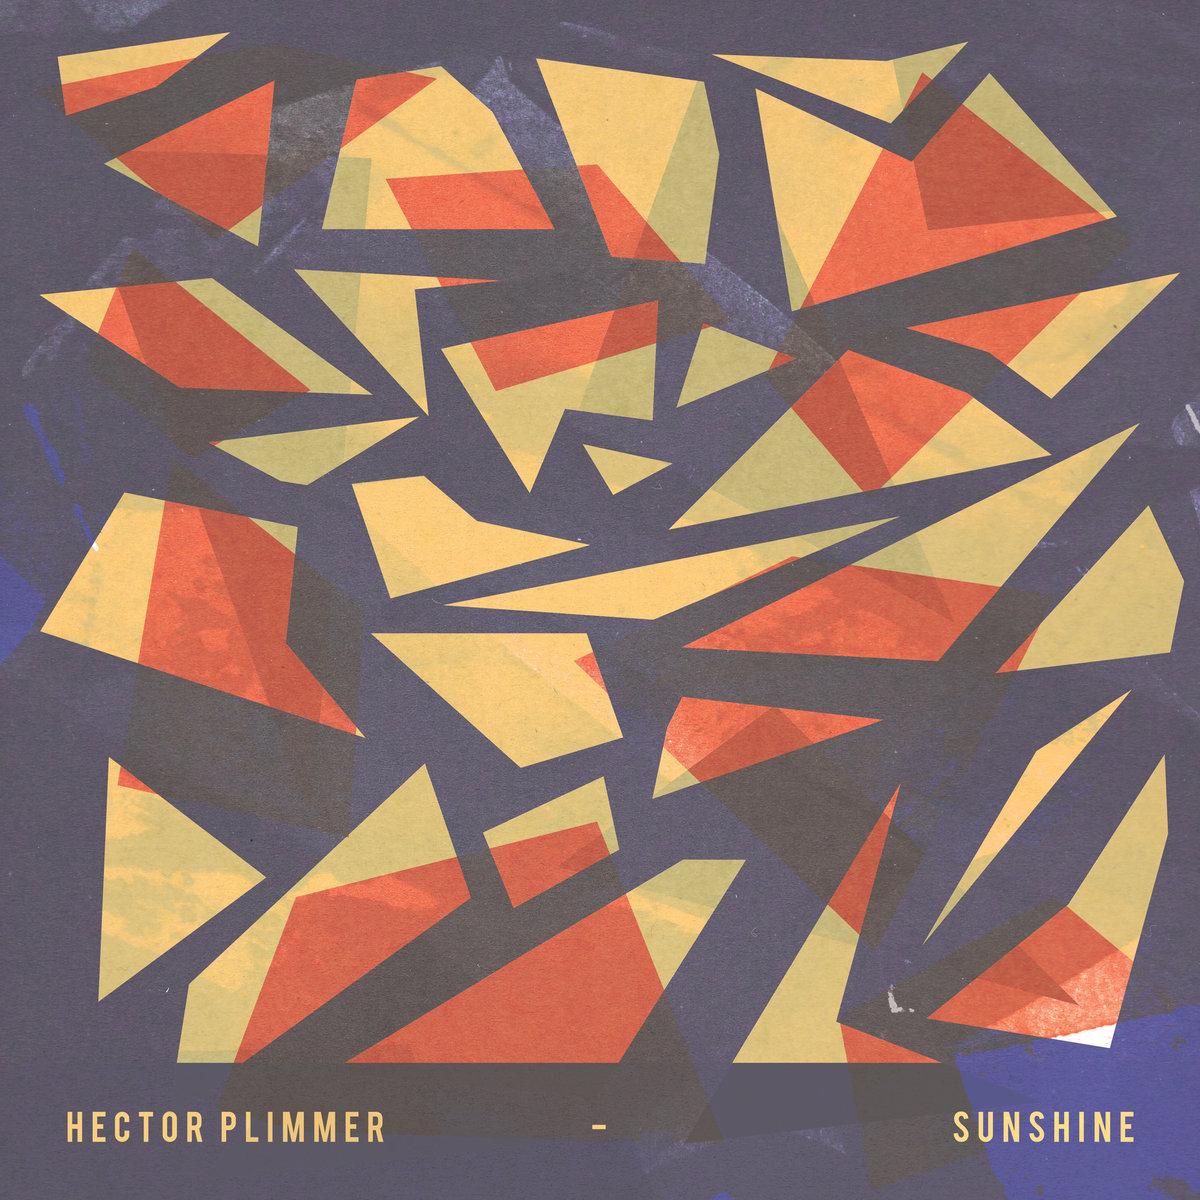 HECTOR PLIMMER - SUNSHINE (ALBERT'S FAVOURITES, 2017)